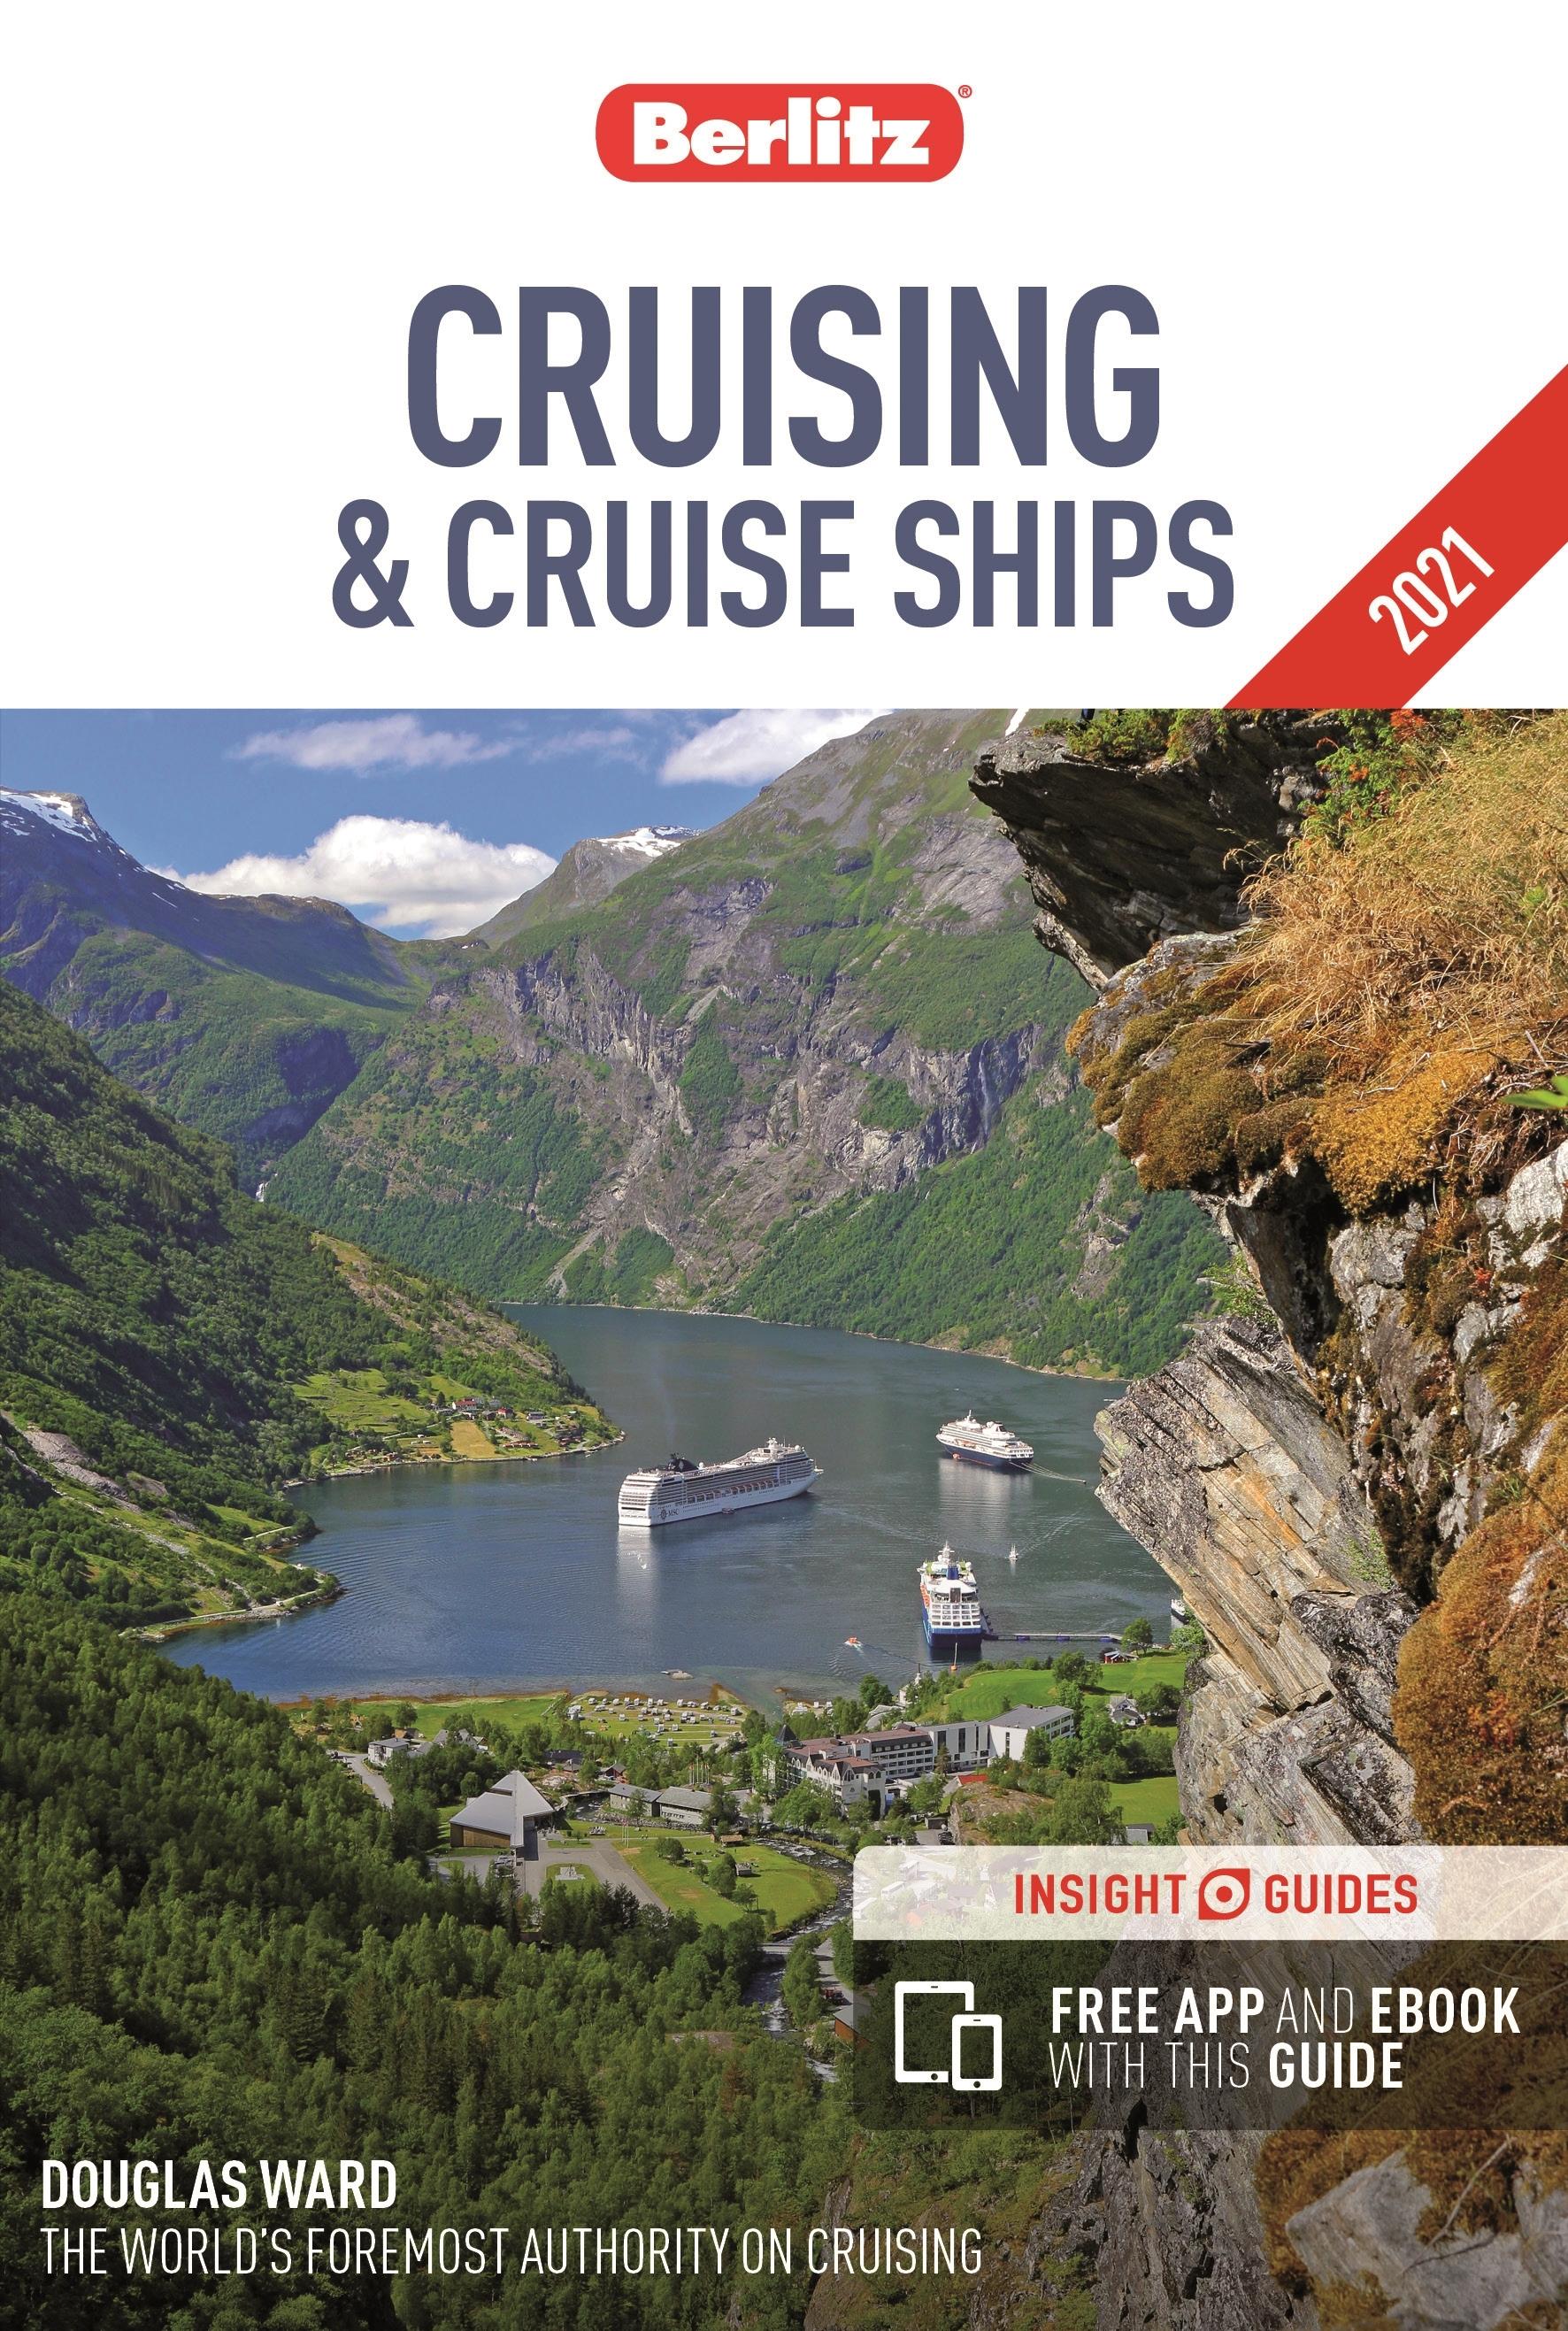 Image for Berlitz cruising & cruise ships 2021